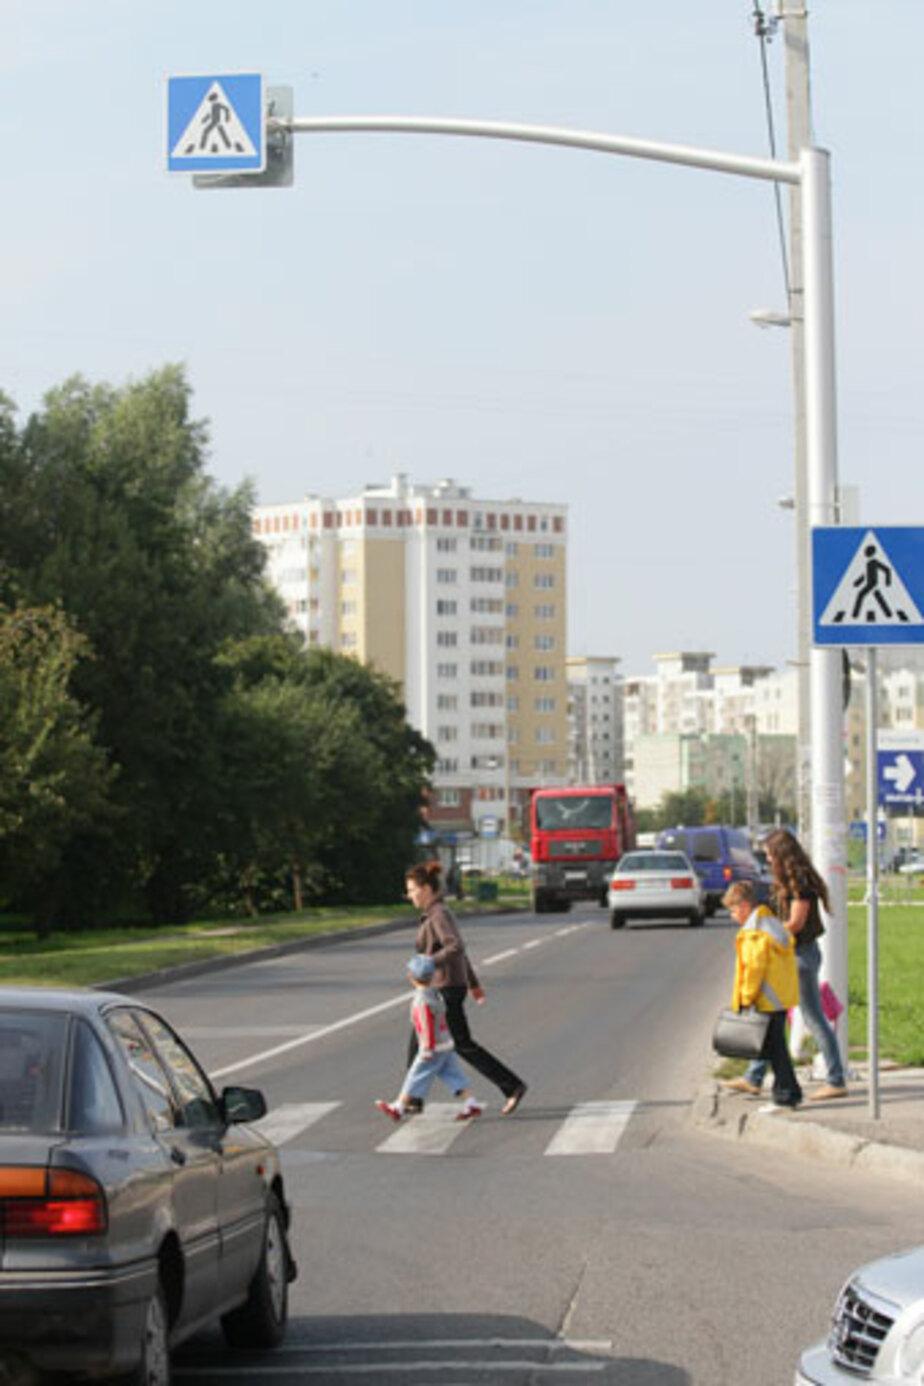 Через «зебру» на Гайдара бегут светящиеся человечки - Новости Калининграда